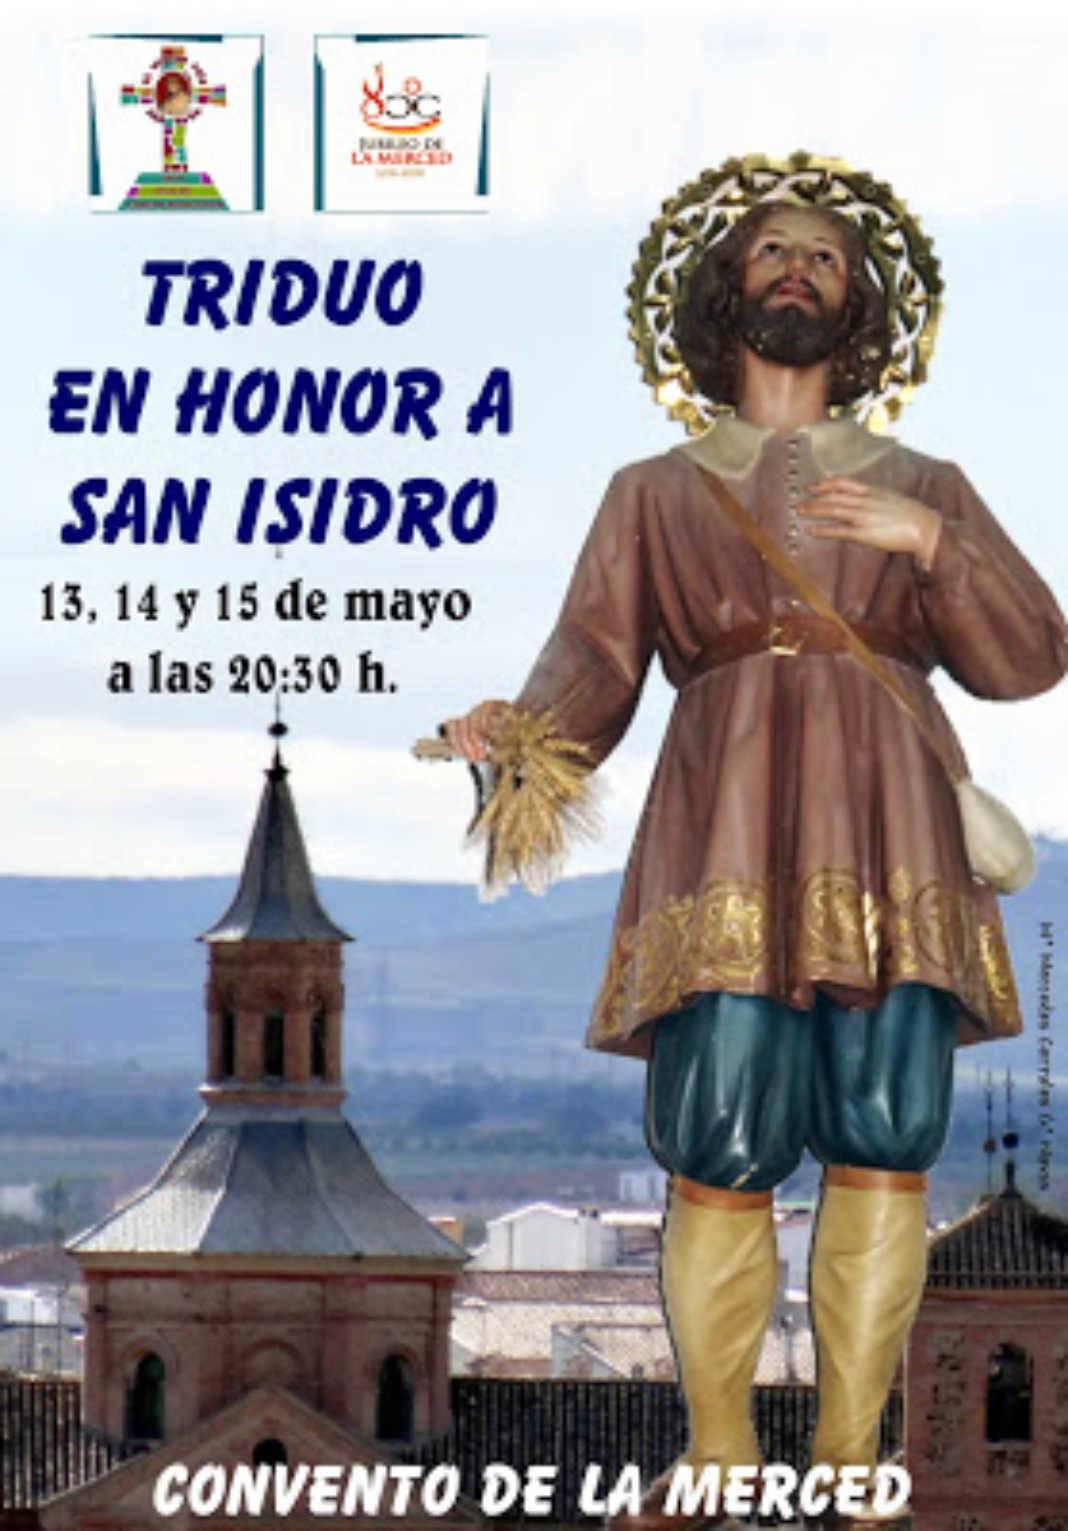 san isidro 1068x1531 - Triduo en honor a San Isidro